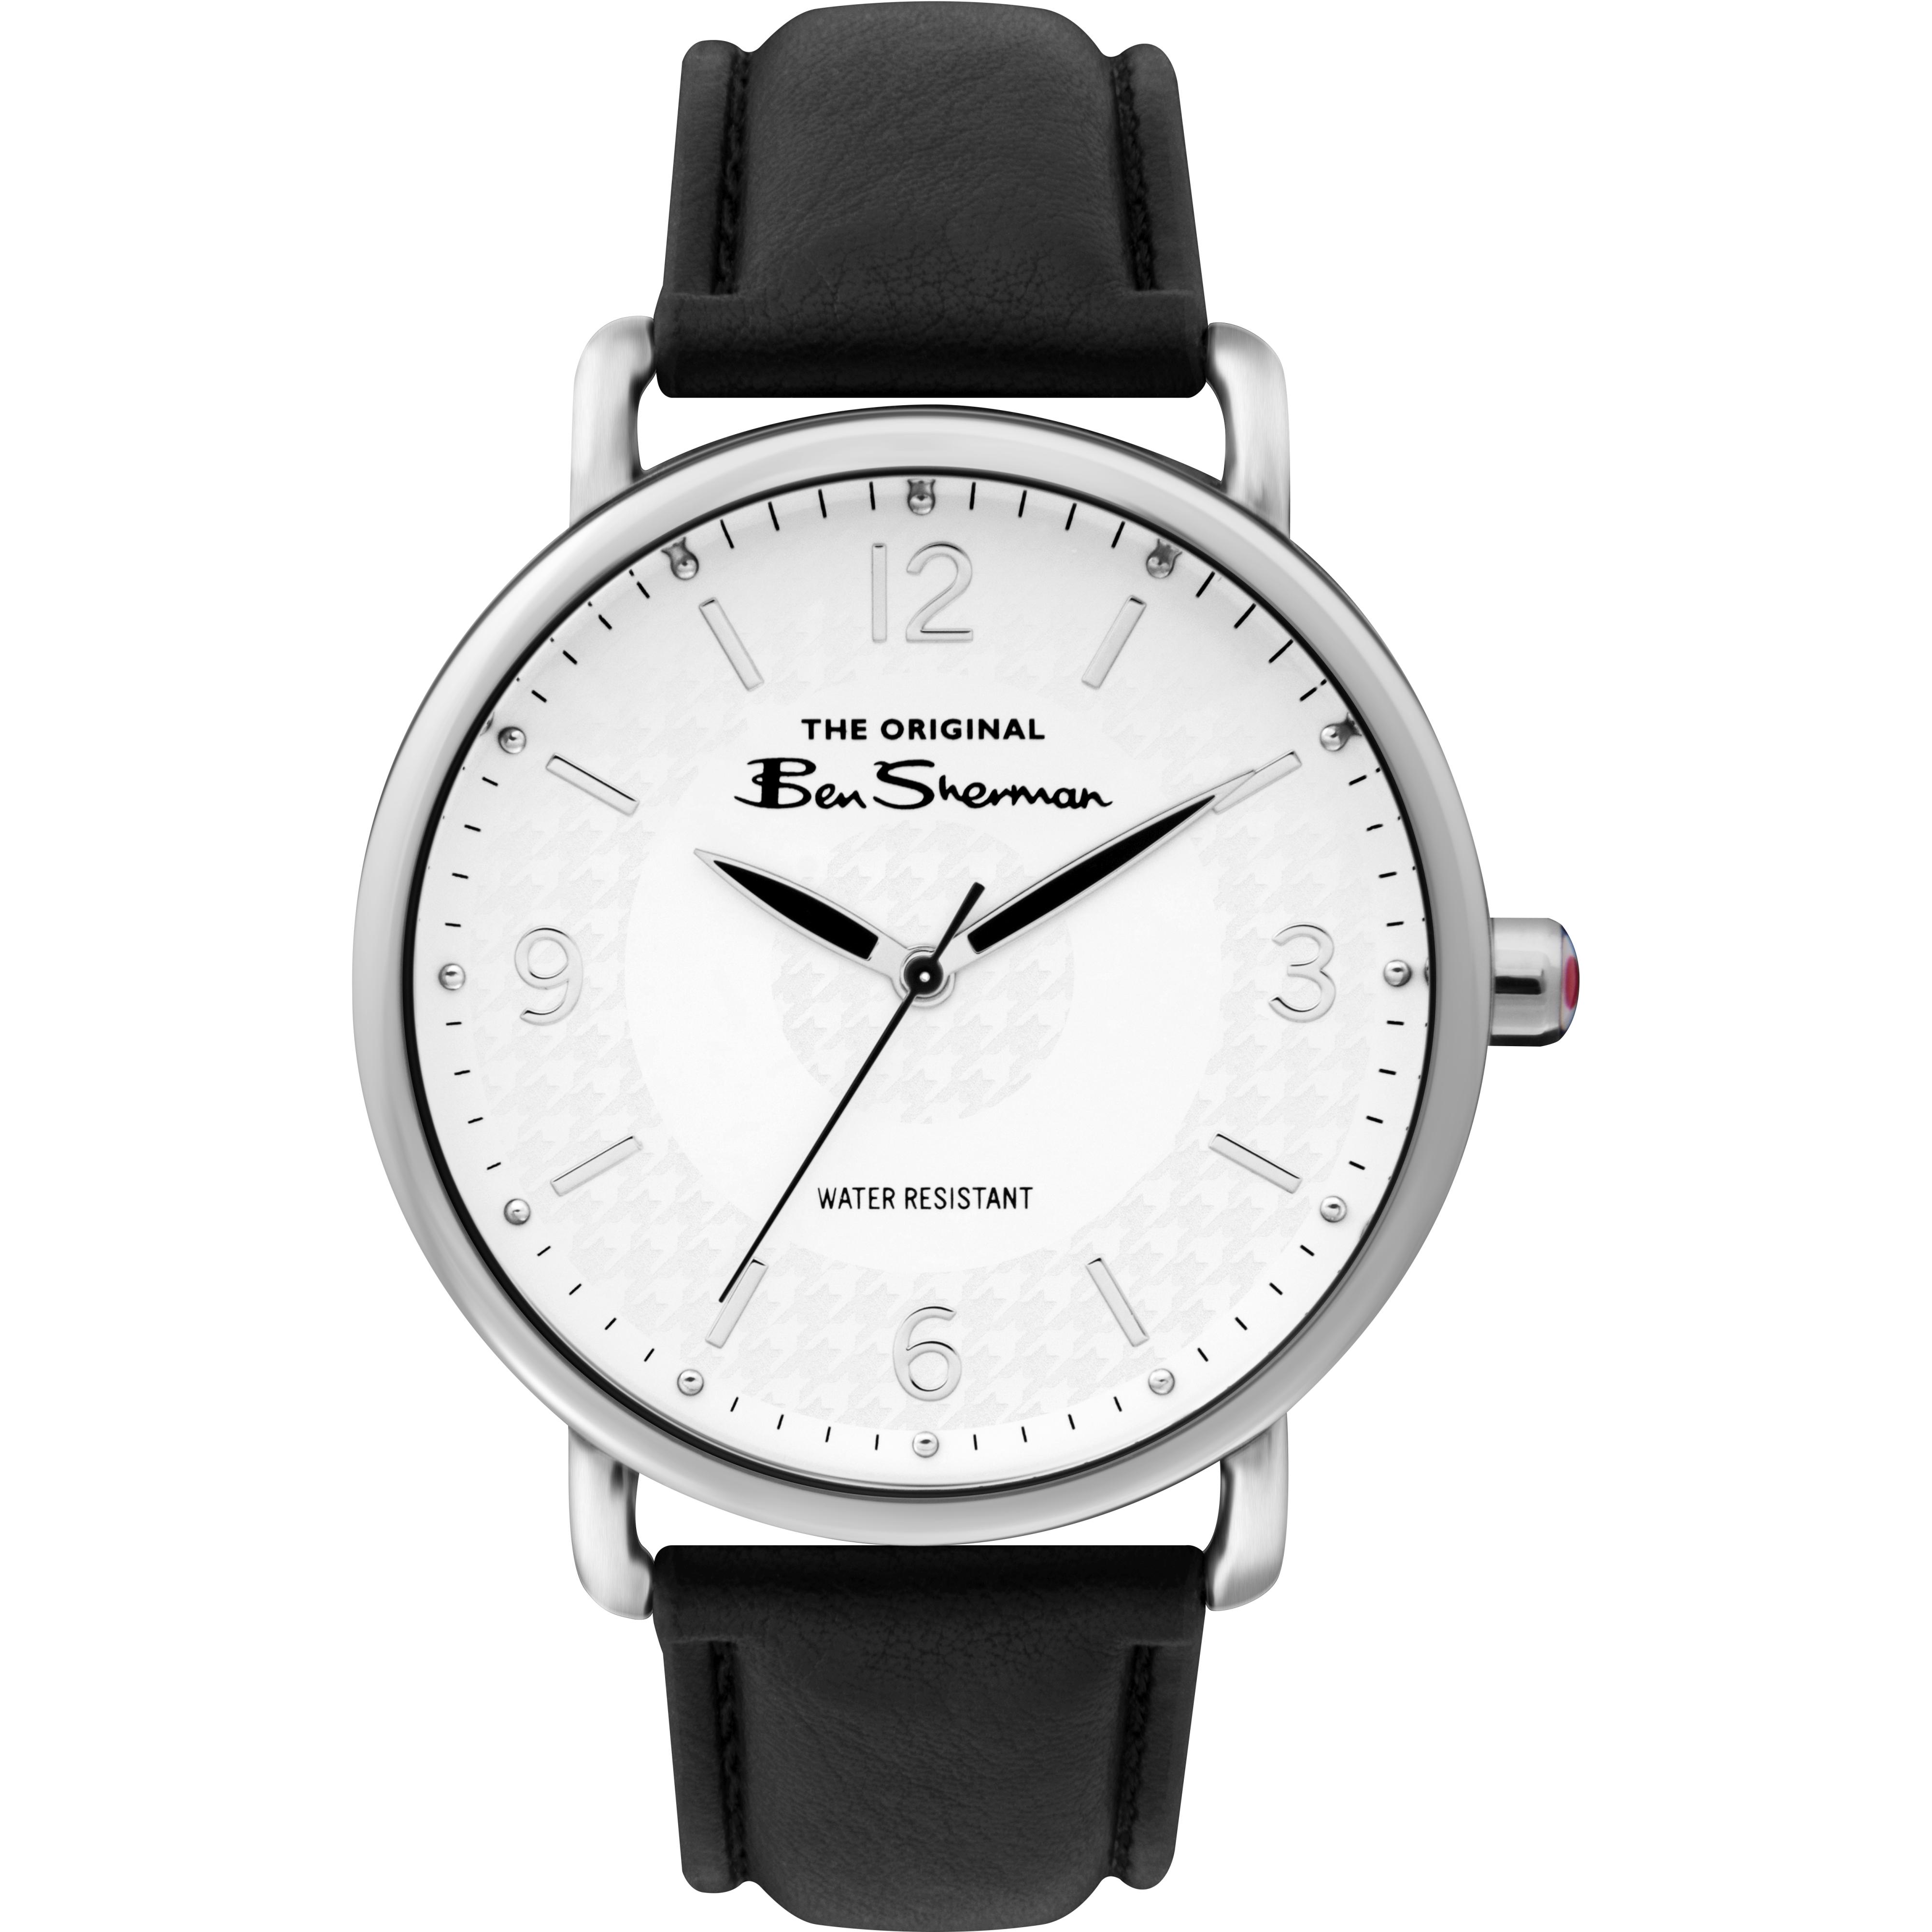 65b55e71 Gents Ben Sherman Watch (BS015B) | WatchShop.com™